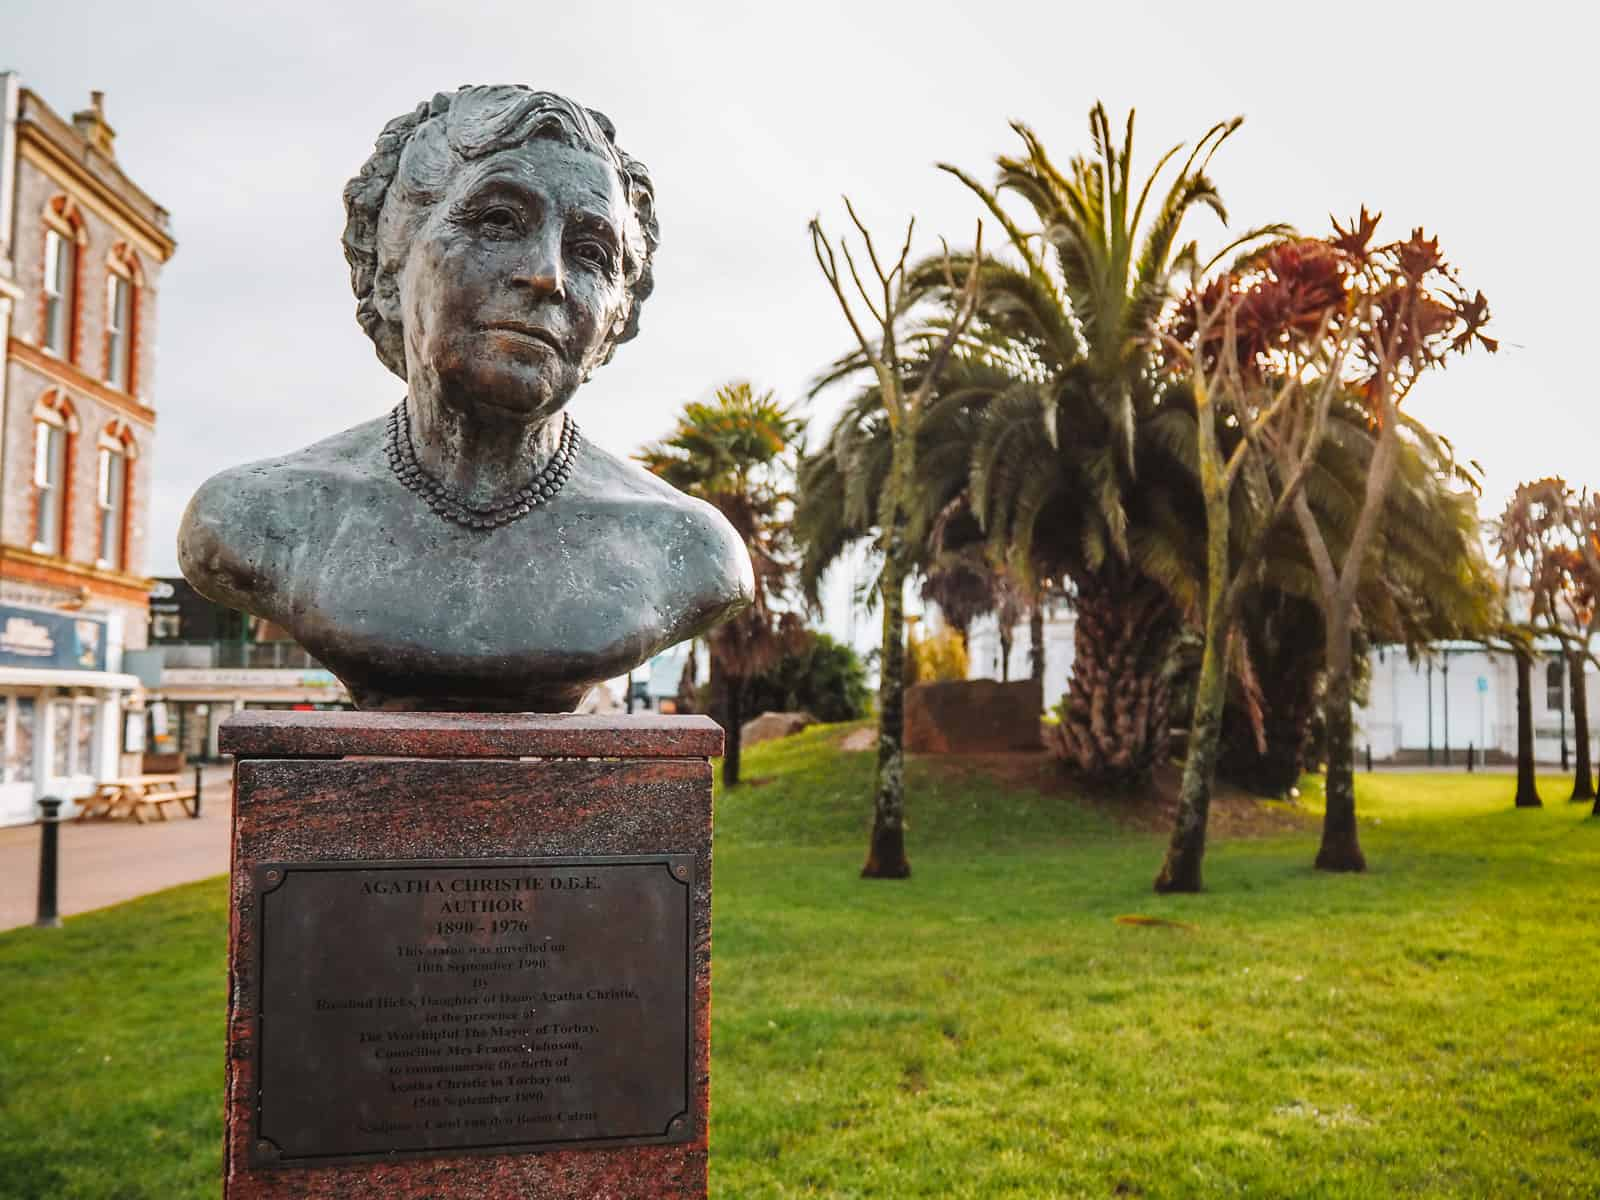 Agatha Christie bust in Torquay | Agatha Christie Mile Torquay